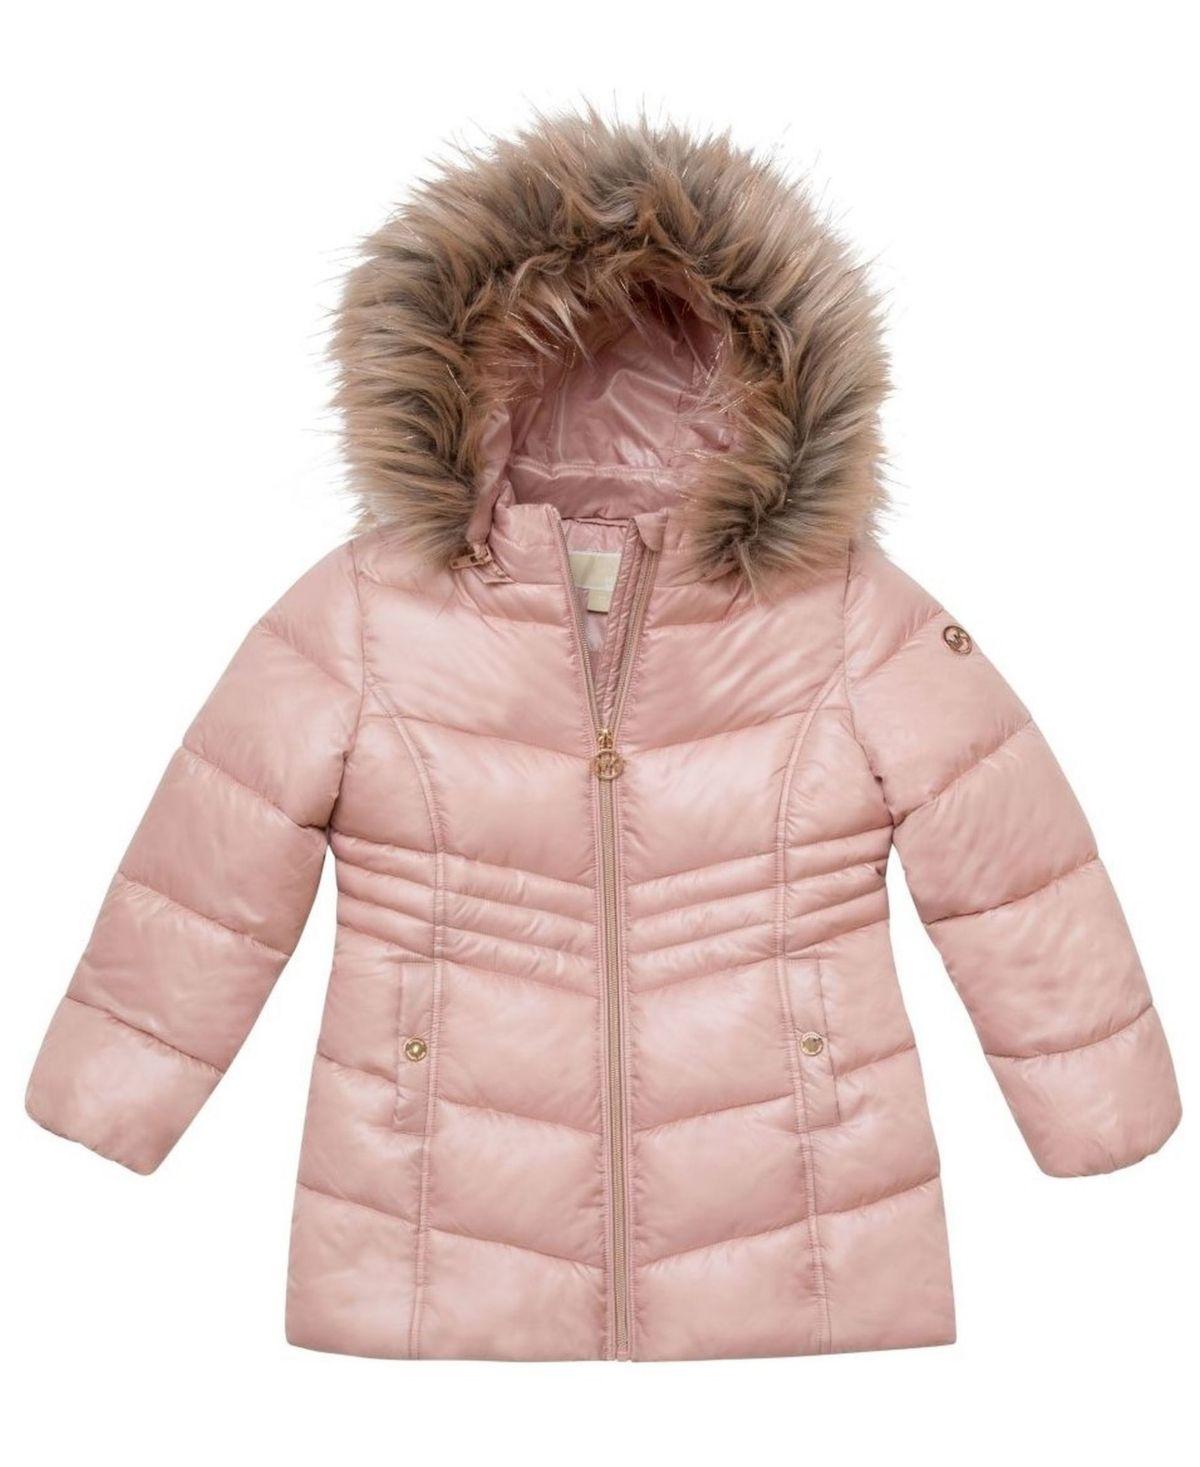 Michael Kors Toddler Girls Stadium Length Puffer Jacket Light Pink In 2021 Girls Puffer Coat Girls Puffer Jacket Toddler Girl Puffer Coats [ 1467 x 1200 Pixel ]